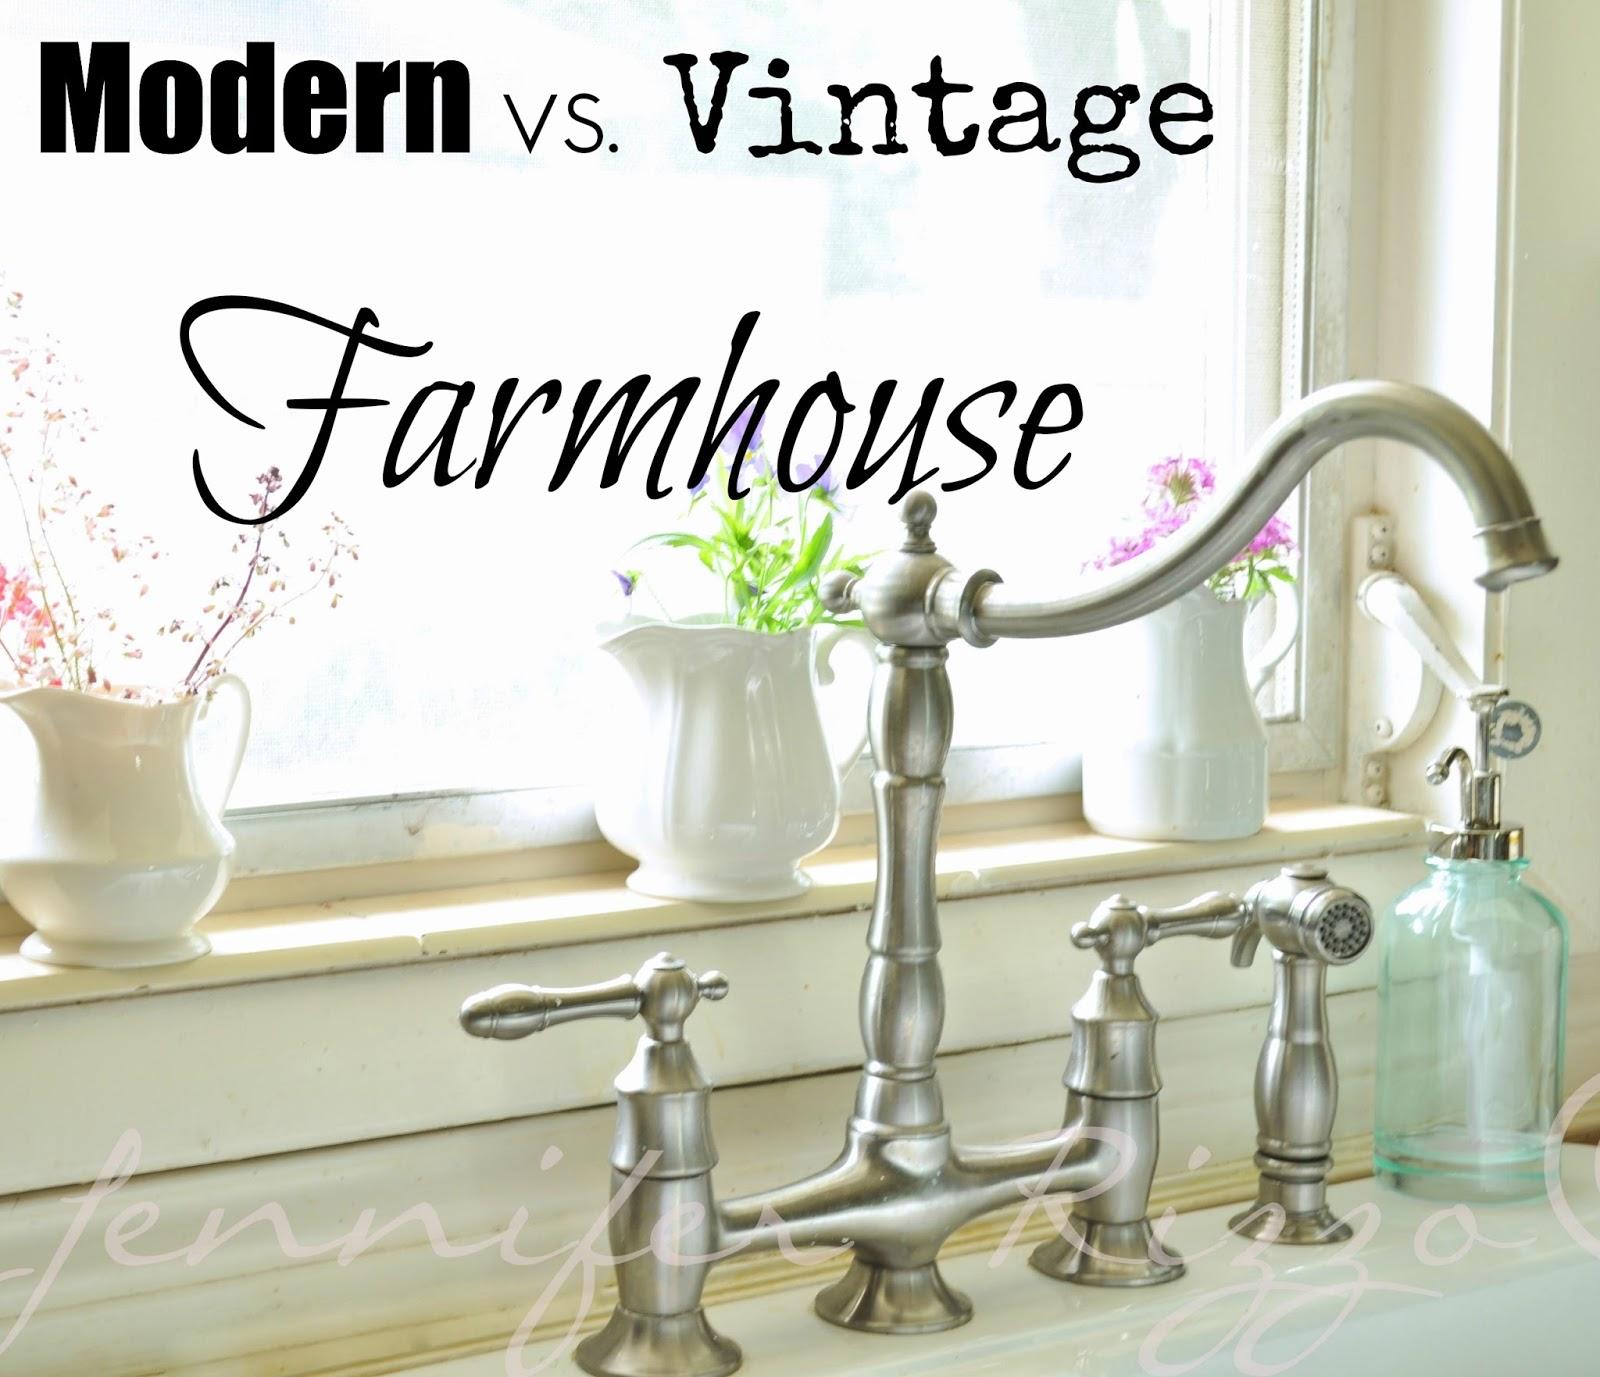 modern vs vintage farmhouse farmhouse faucet kitchen The difference between modern vs vintage farmhouse